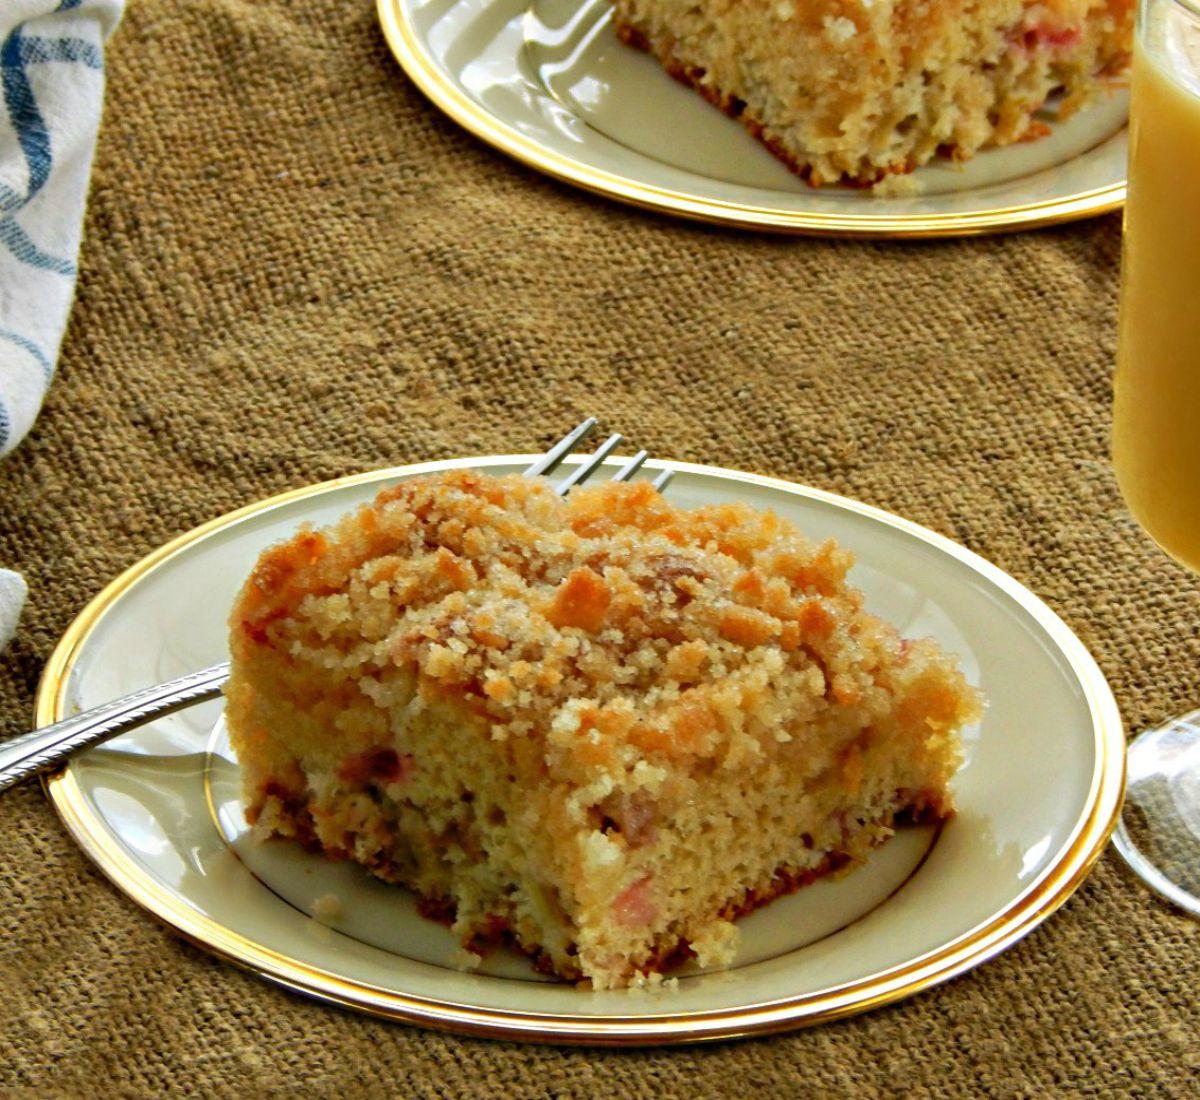 Sour Cream Rhubarb Coffee Cake Recipe In 2020 Rhubarb Coffee Cakes Rhubarb Recipes Rhubarb And Custard